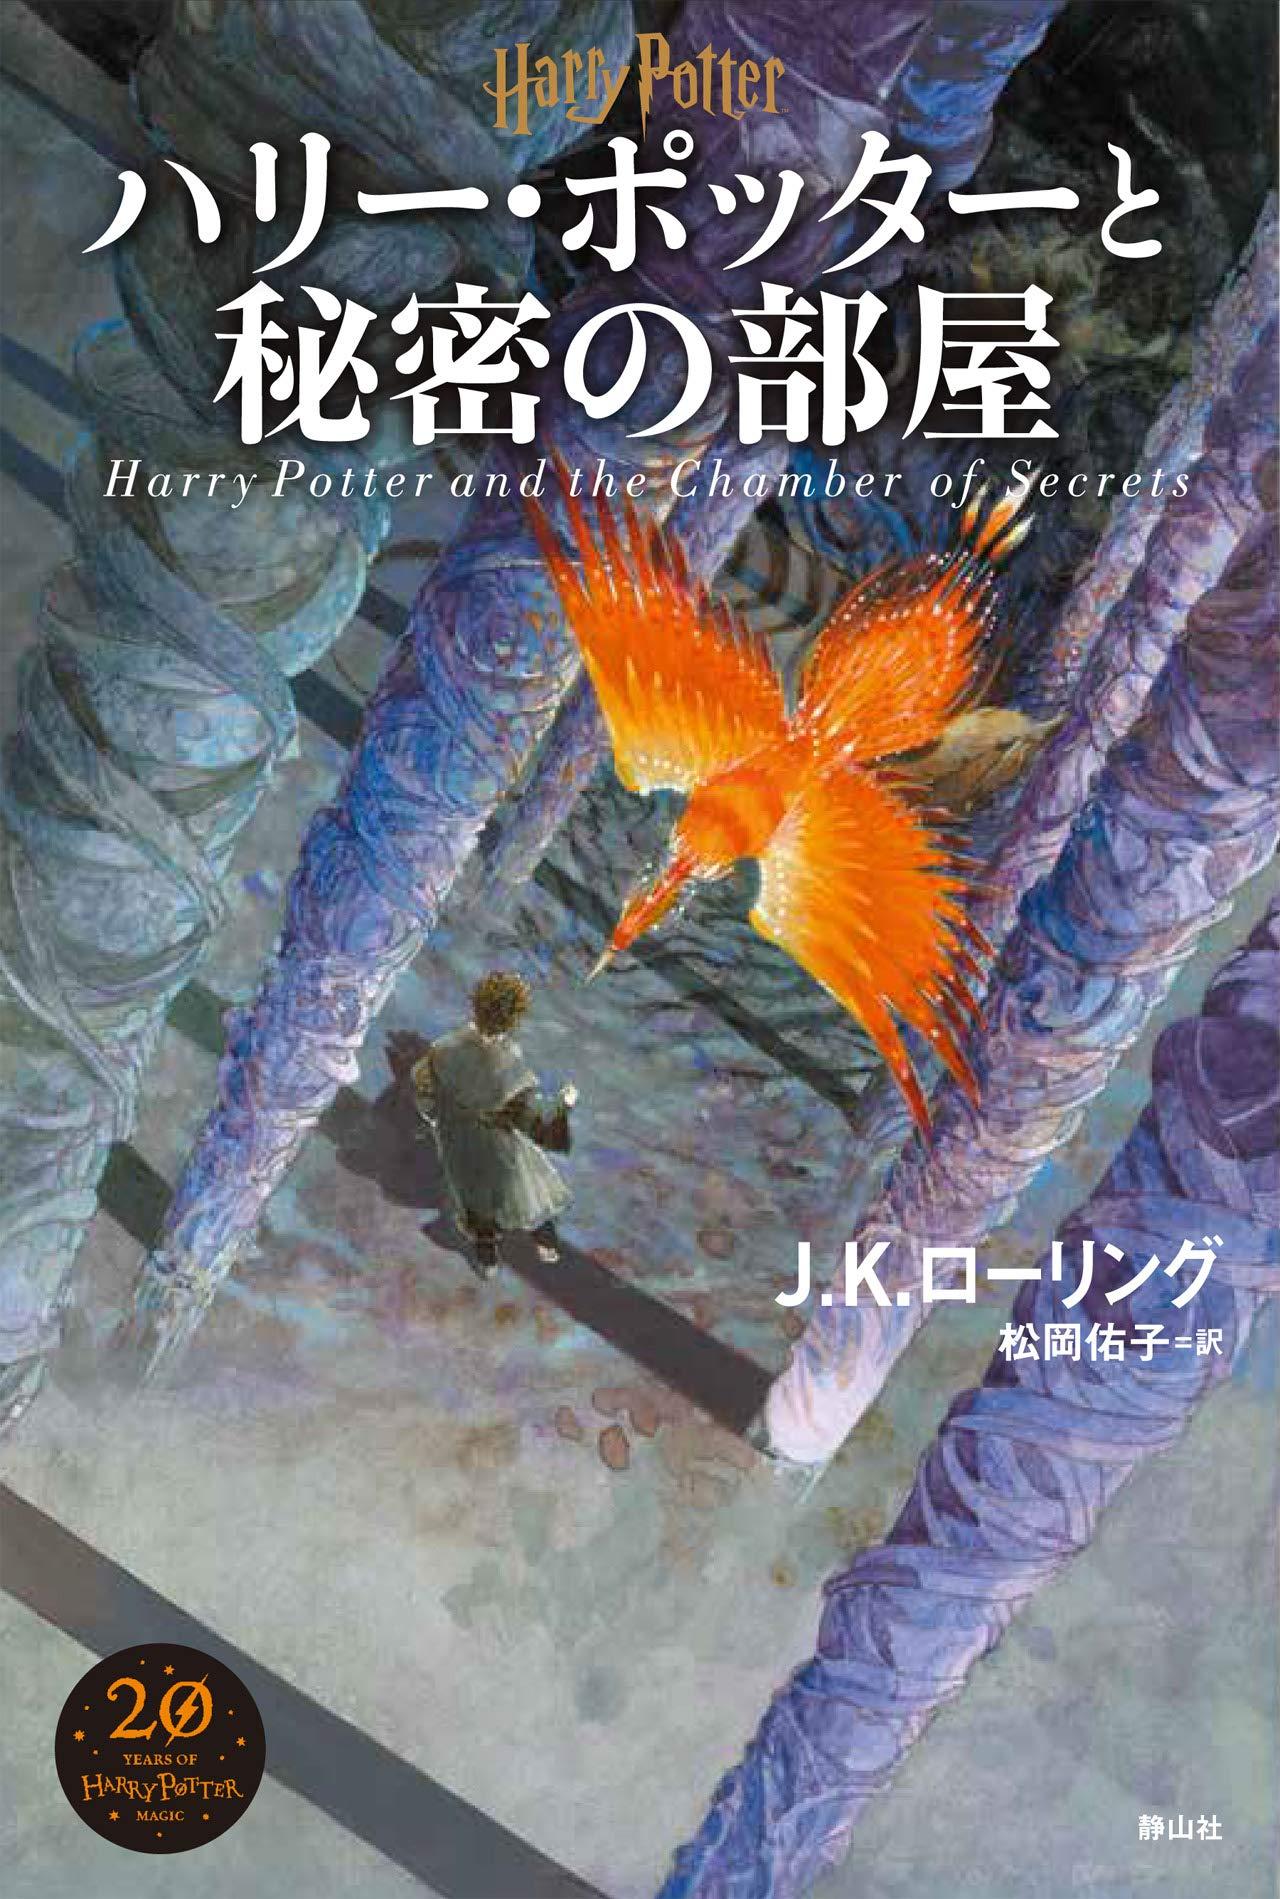 CS-Cover JA 20thAnniversary.jpg